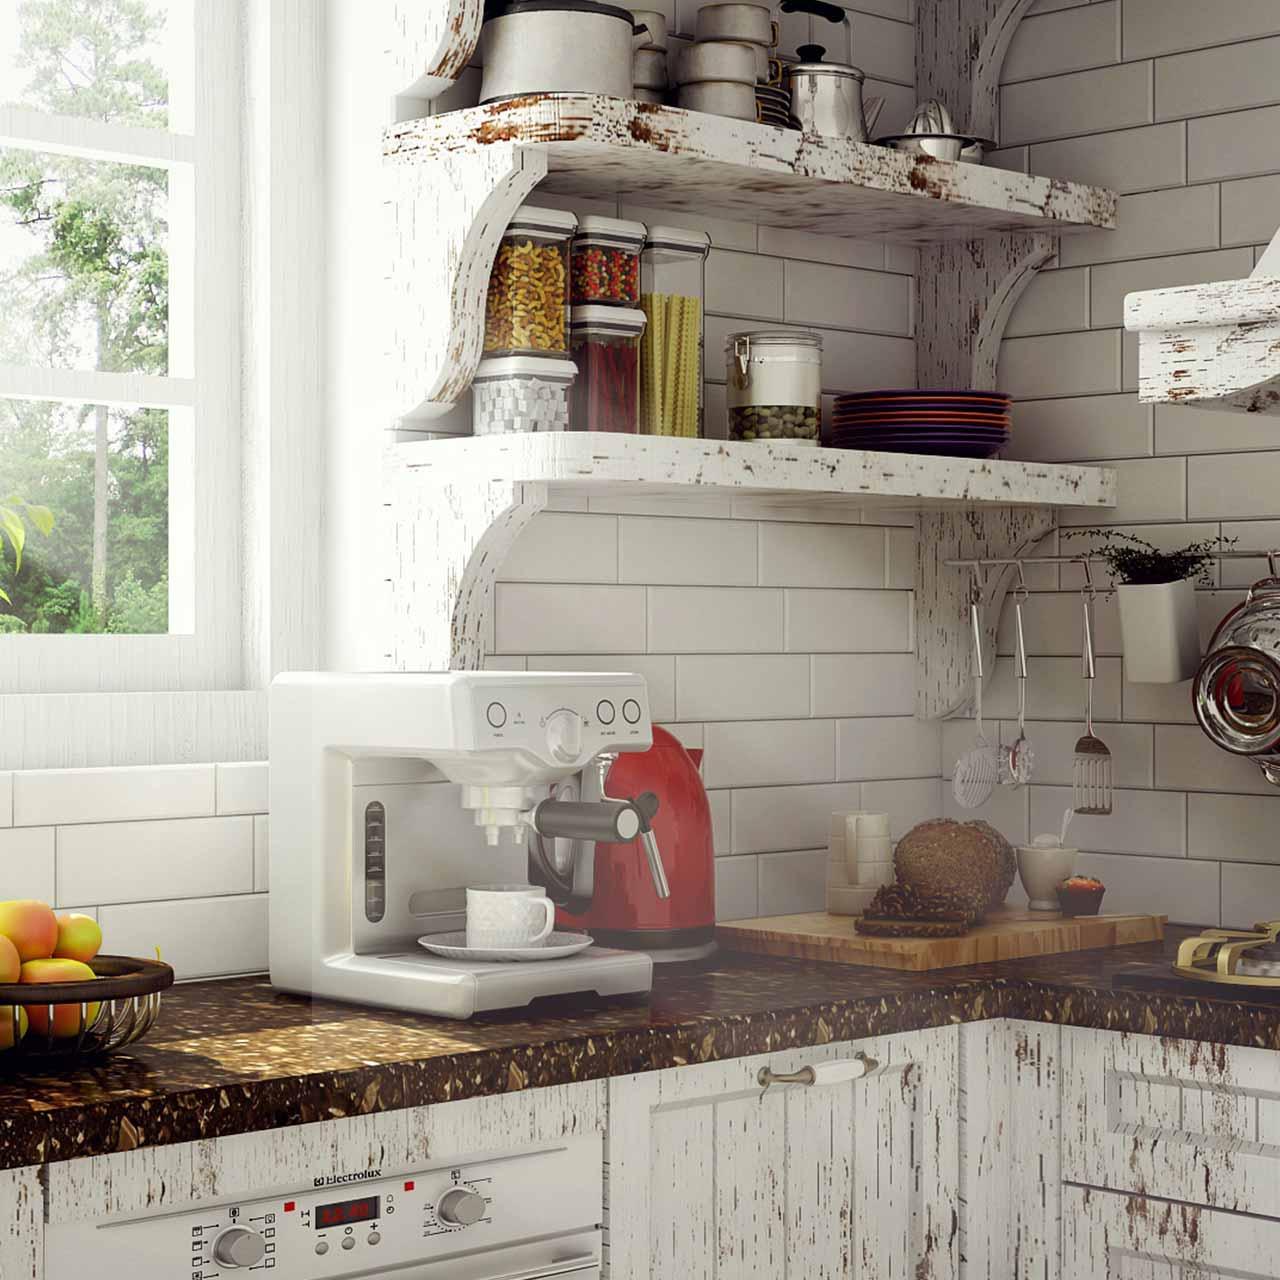 Kitchen Shelves - Design Ideas For Kitchen